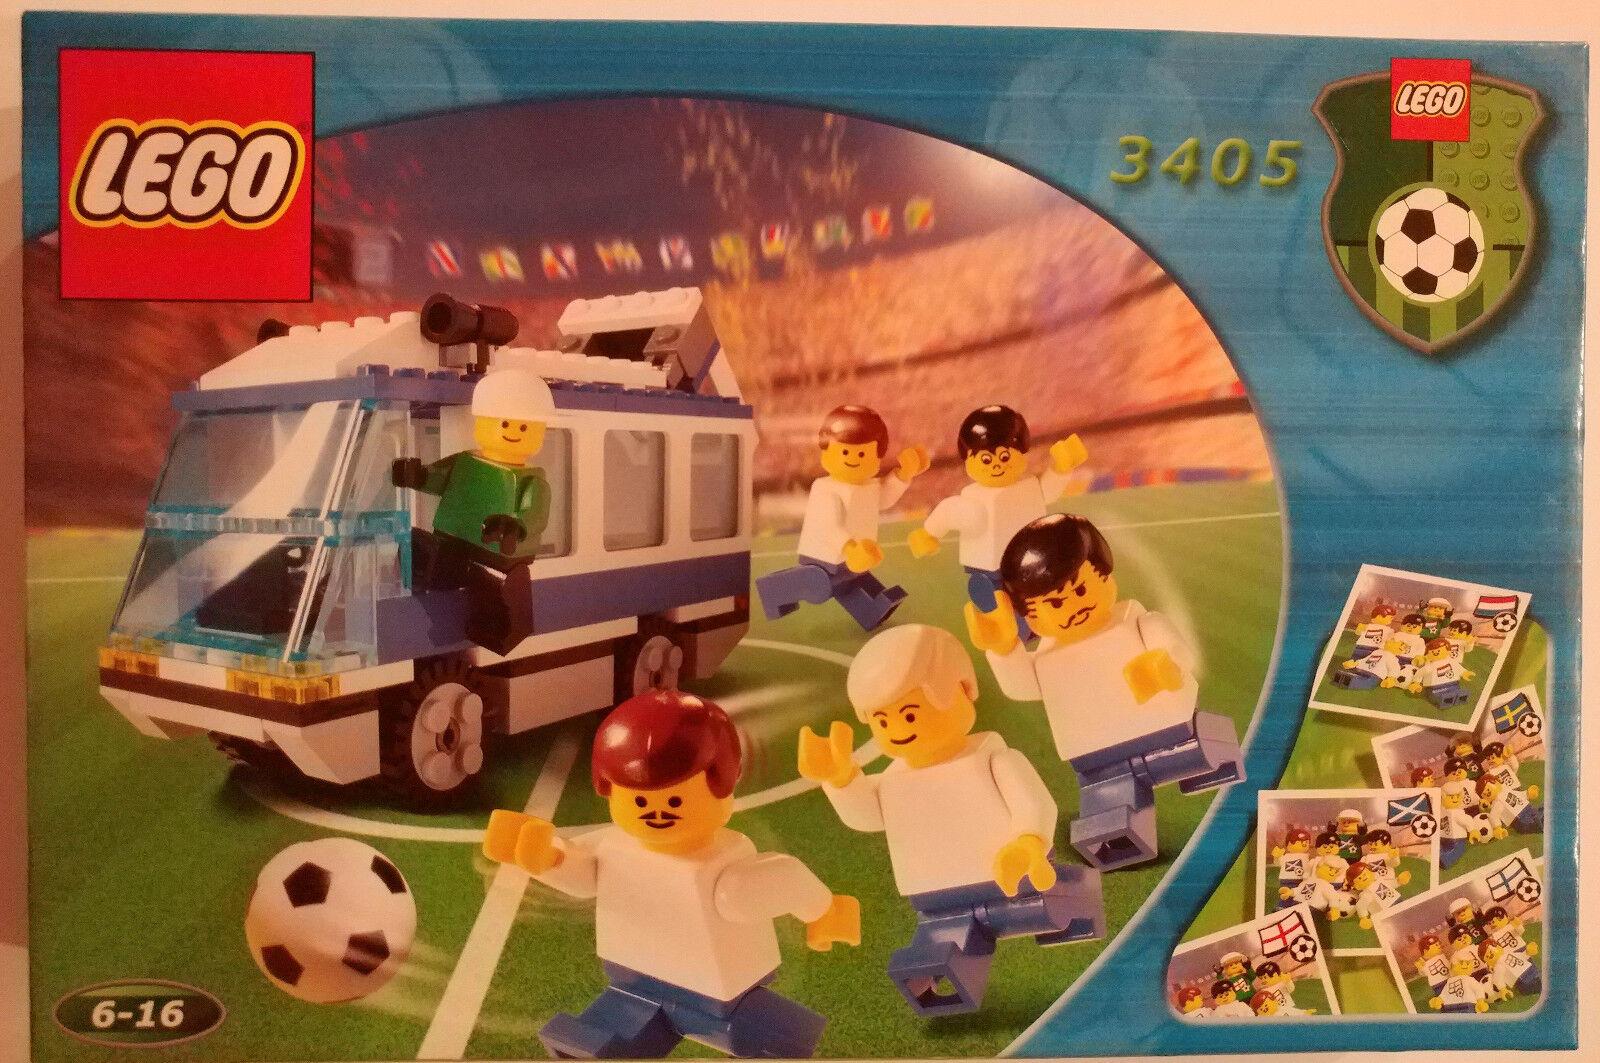 LEGO Sports Set 3405 Soccer Team Transport Bus Football New In Box Sealed NIB